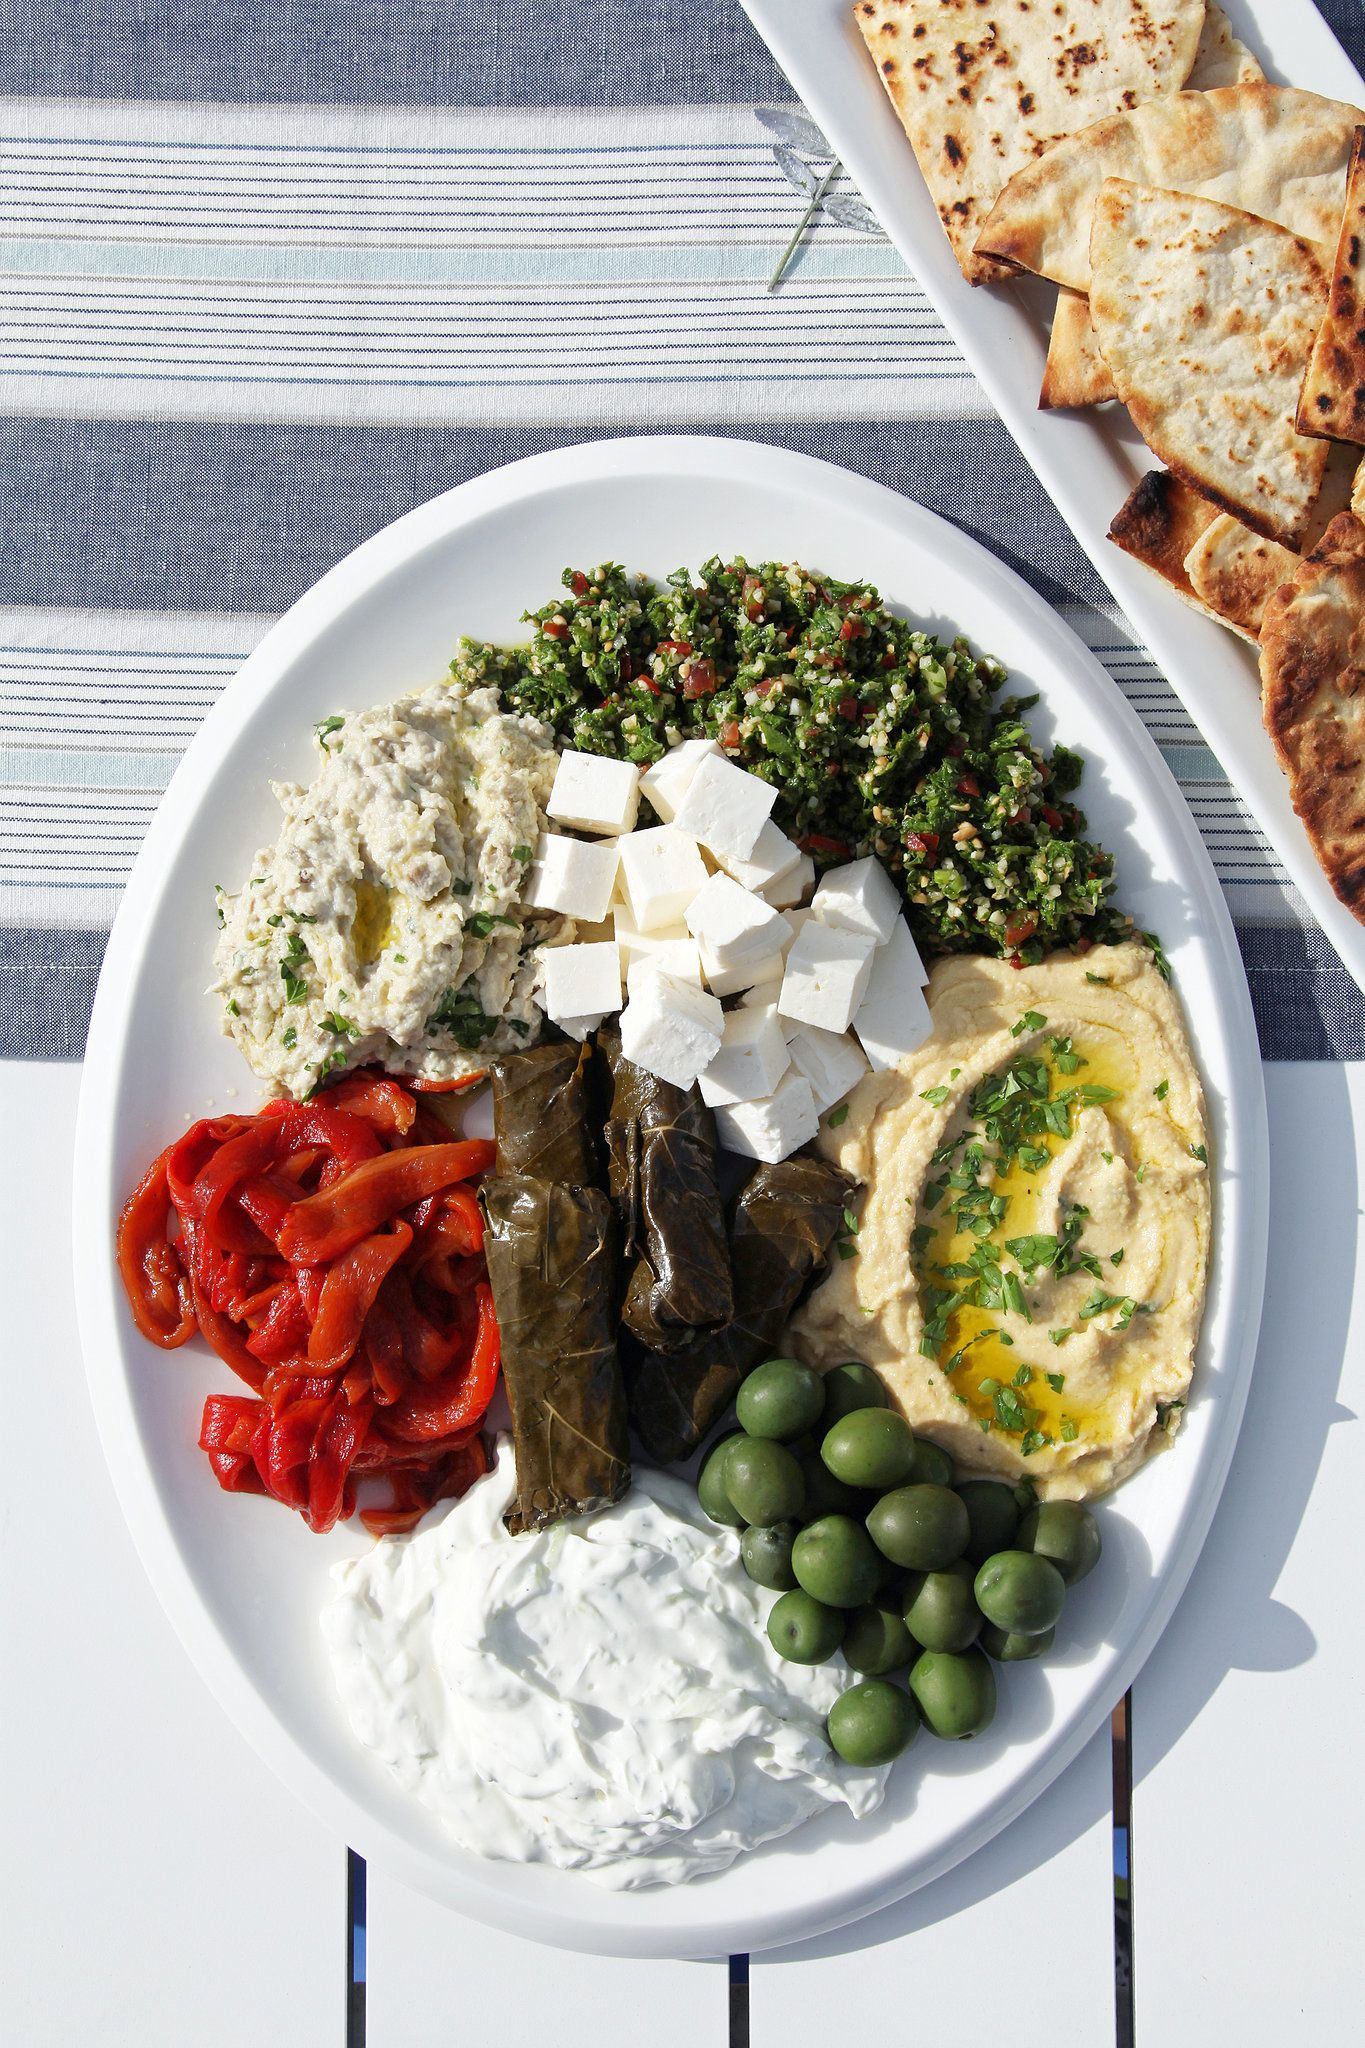 Mezze Platter Ideas - Mediterranean Platter of Grilled Pita ...